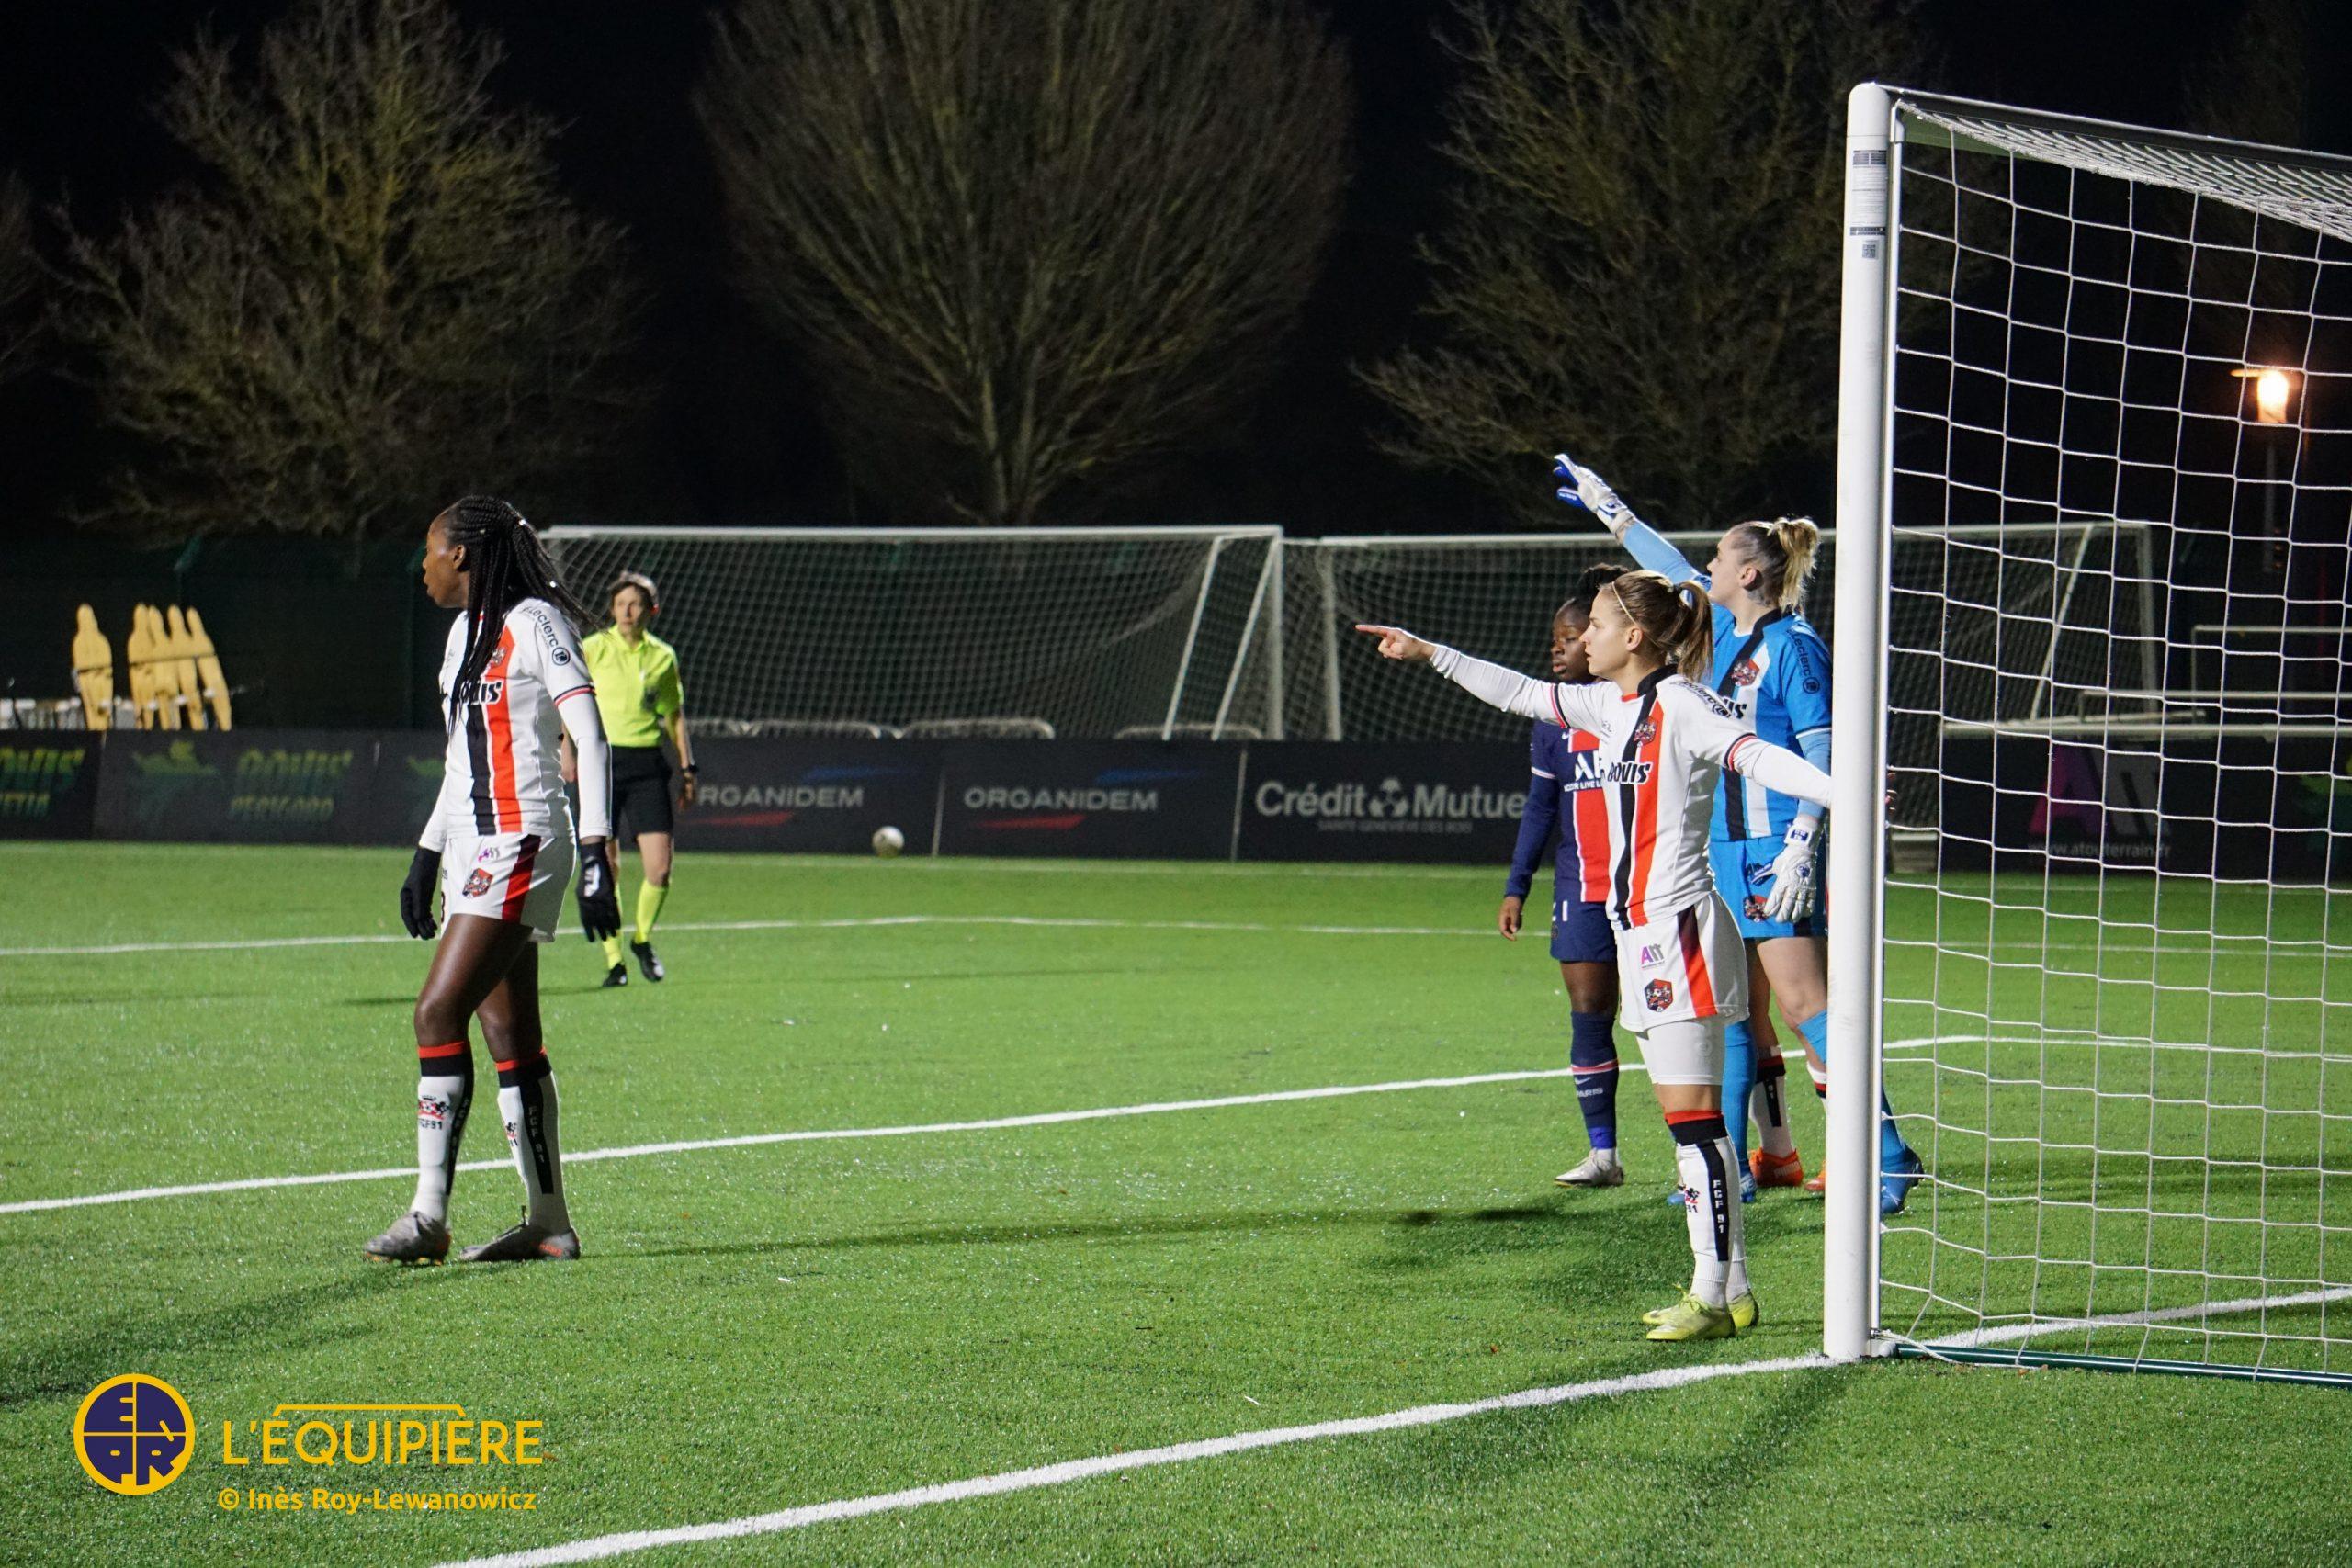 FC Fleury - Sissoko, Grabowska, Heil